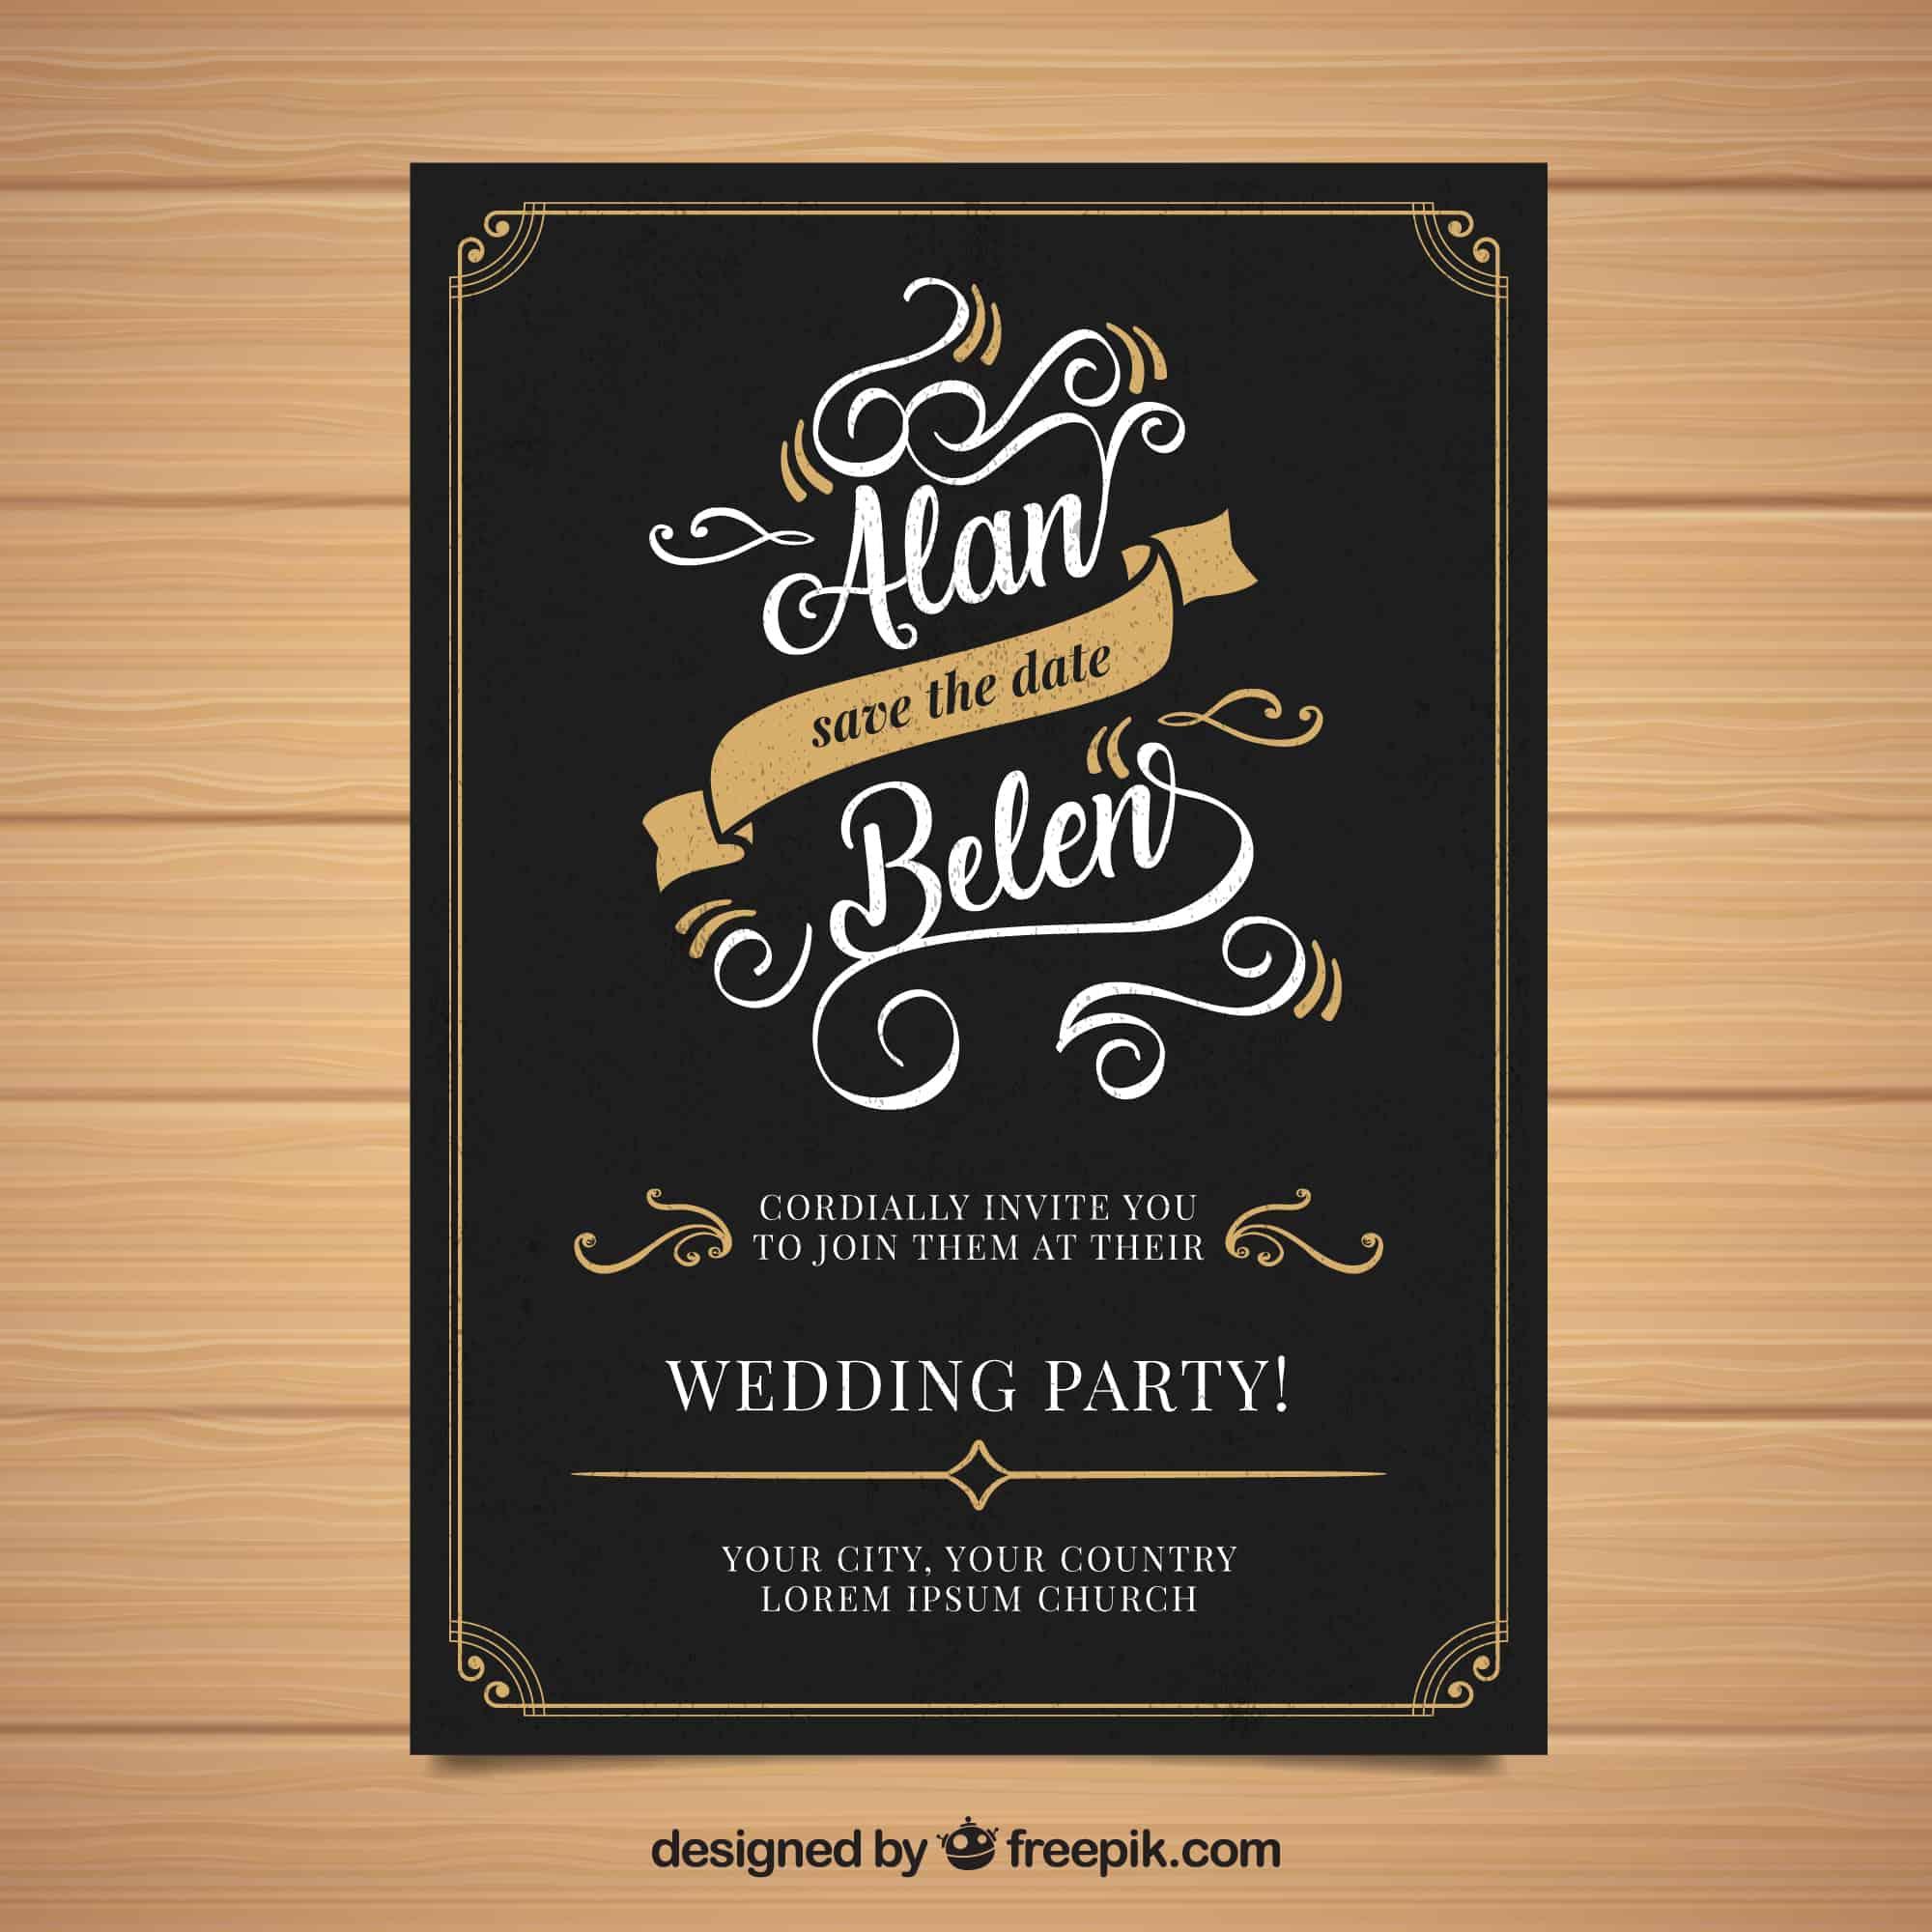 Hipster Wedding Invitation